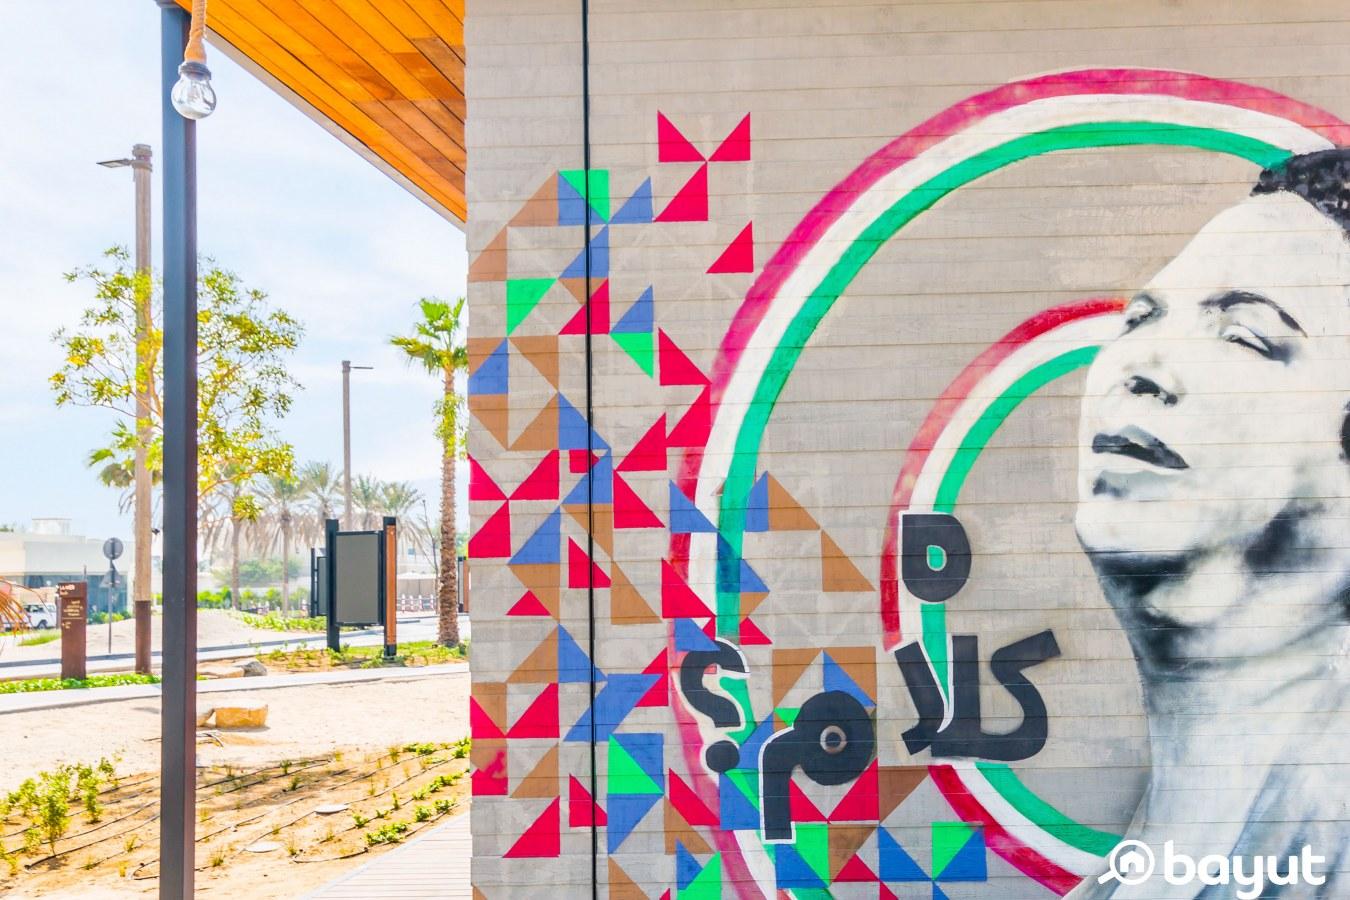 A colourful graffiti at La Mer Dubai beachfront development